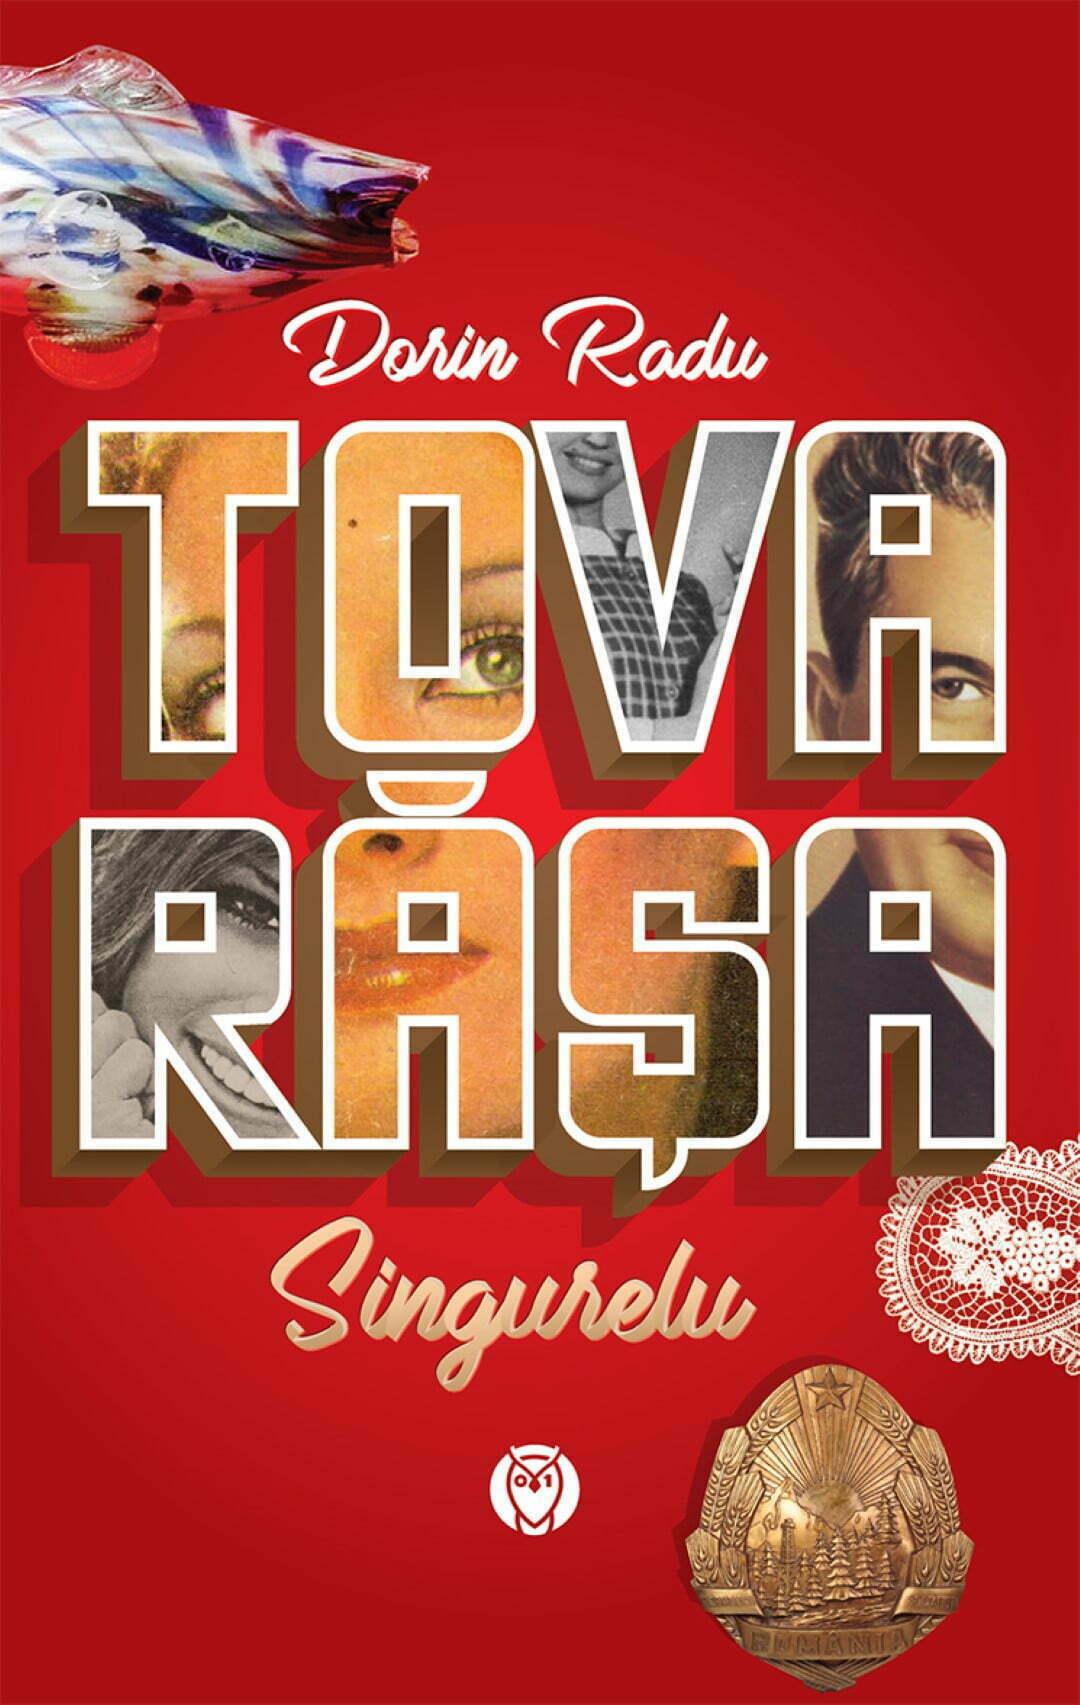 Dorin_Radu - Tovarasa_singurelu.indd